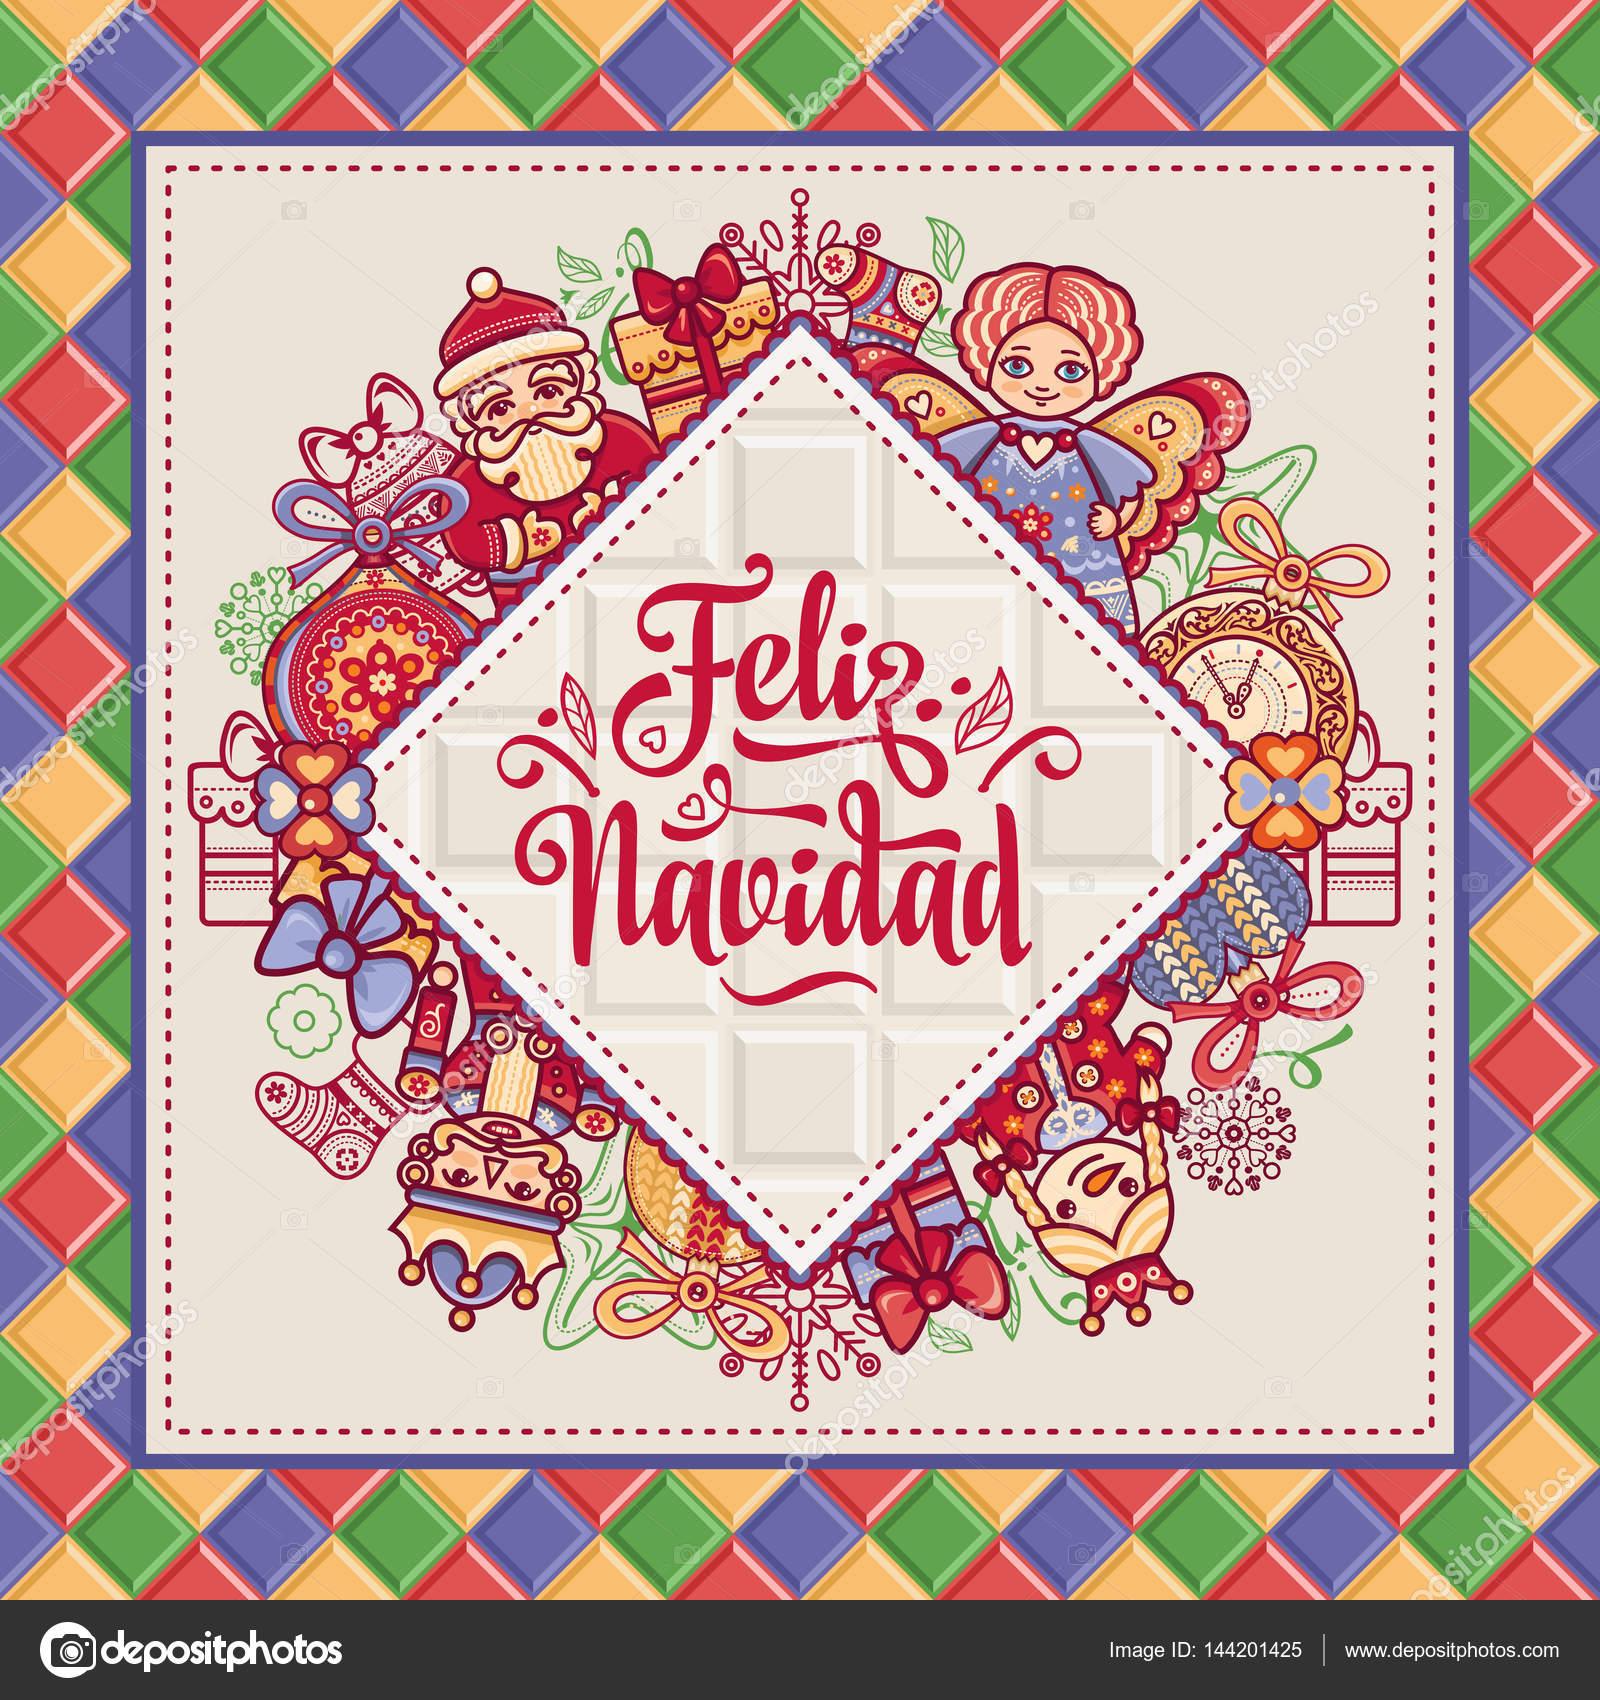 Feliz Navidad Greeting Card In Spain Xmas Festive Background